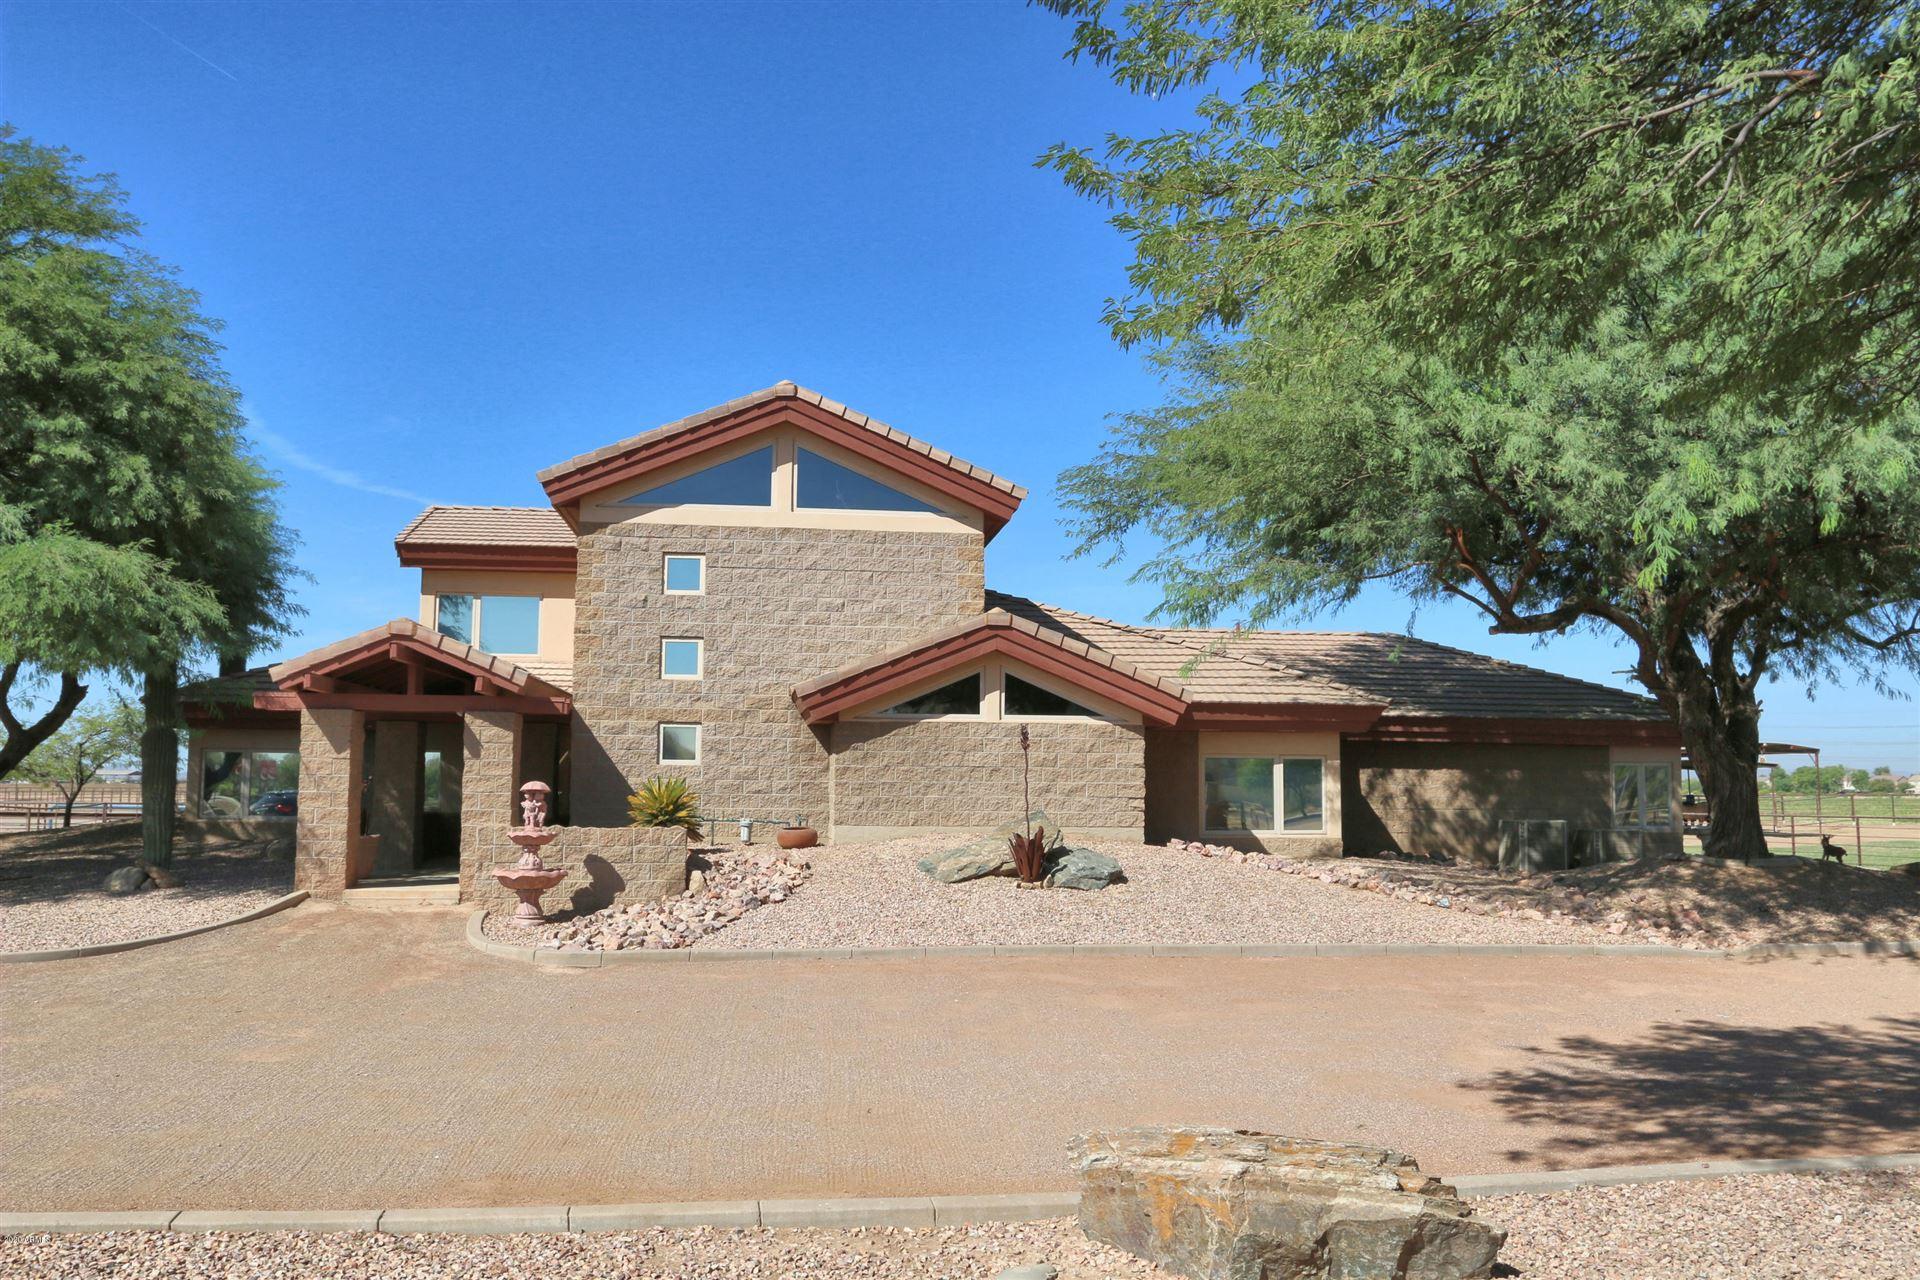 3840 S 83RD Avenue, Phoenix, AZ 85043 - MLS#: 6138285